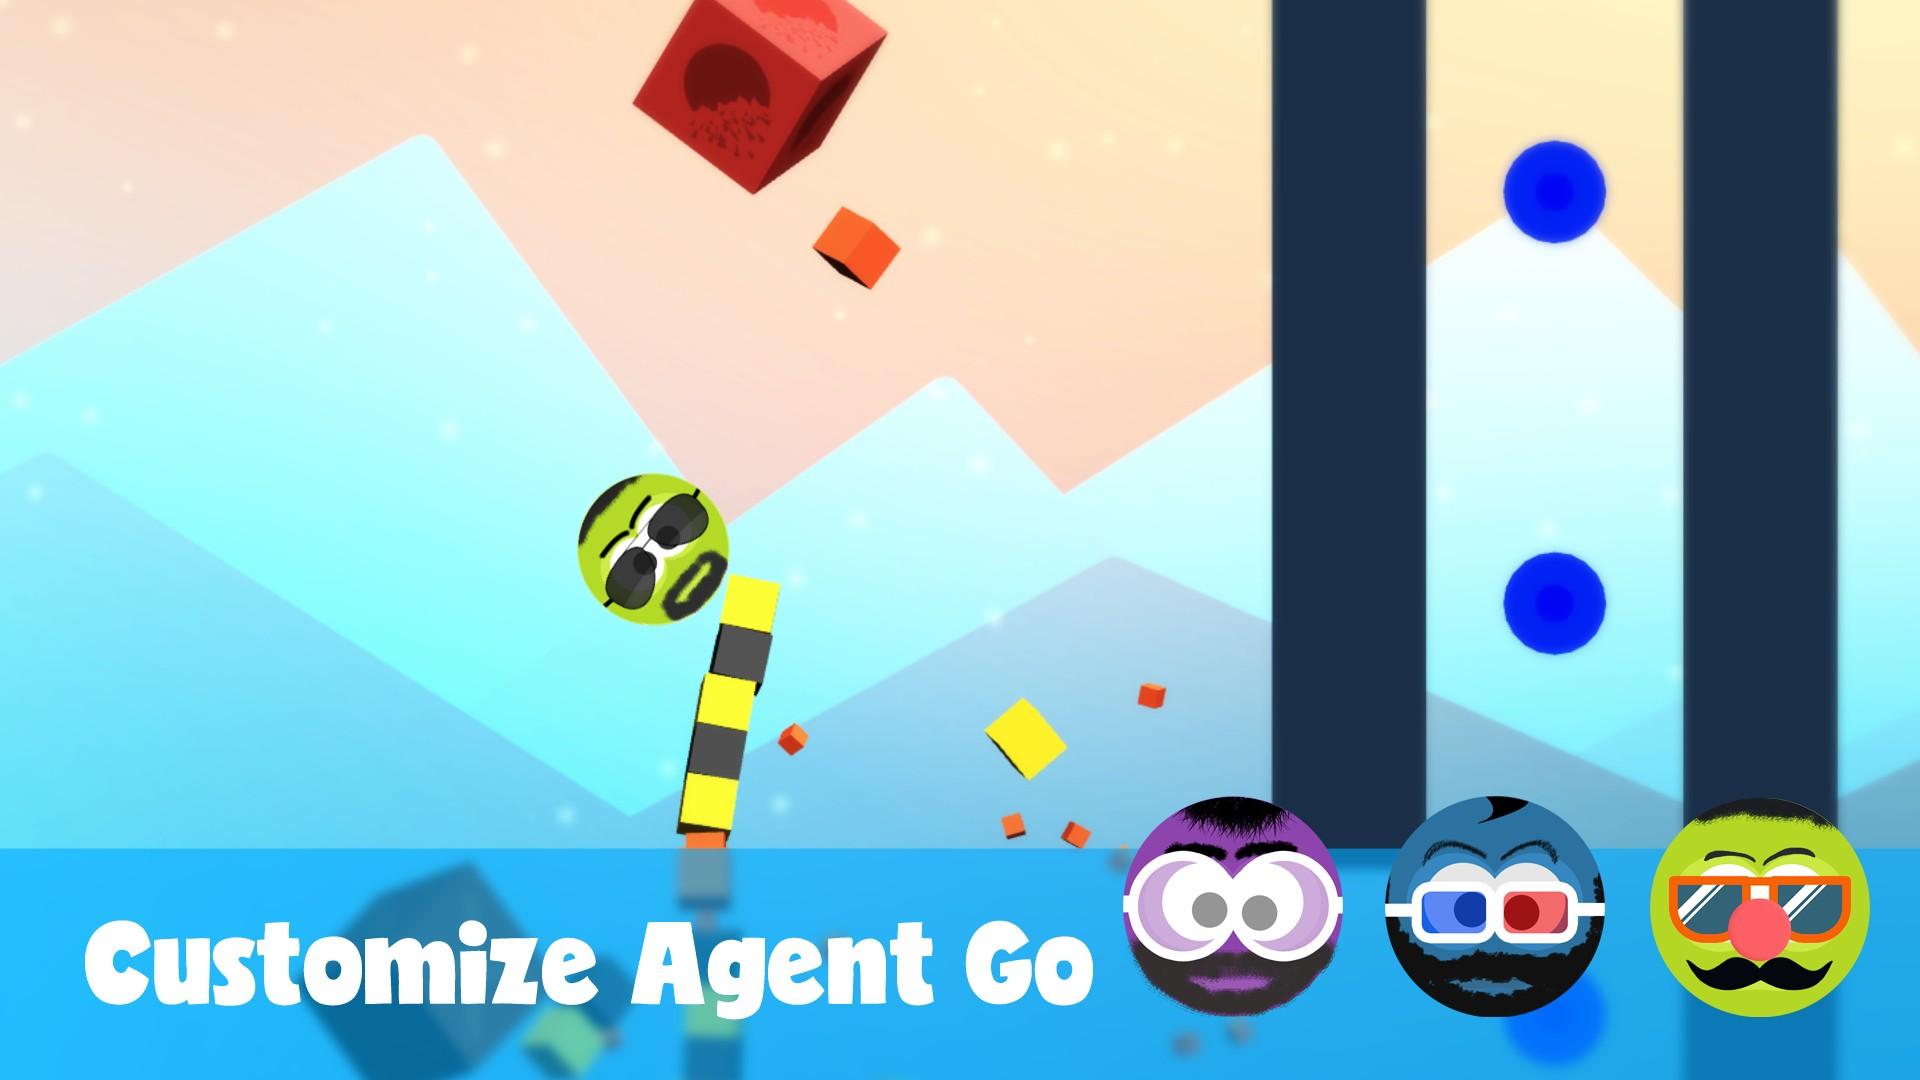 Secret Agent Go!